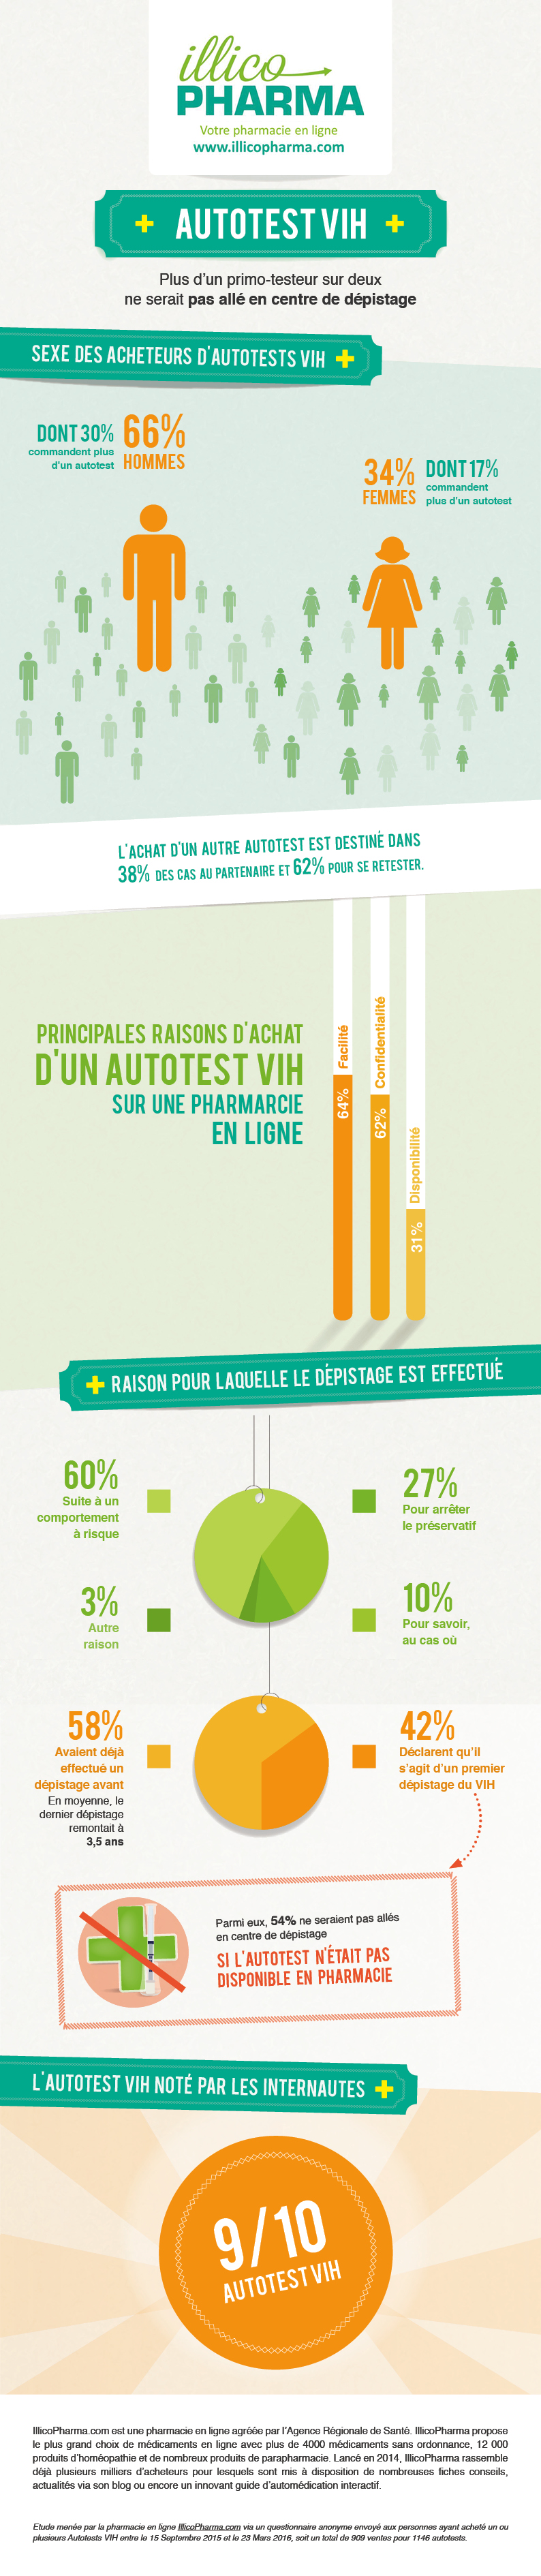 Infographie Autotest VIH 2016 IllicoPharma